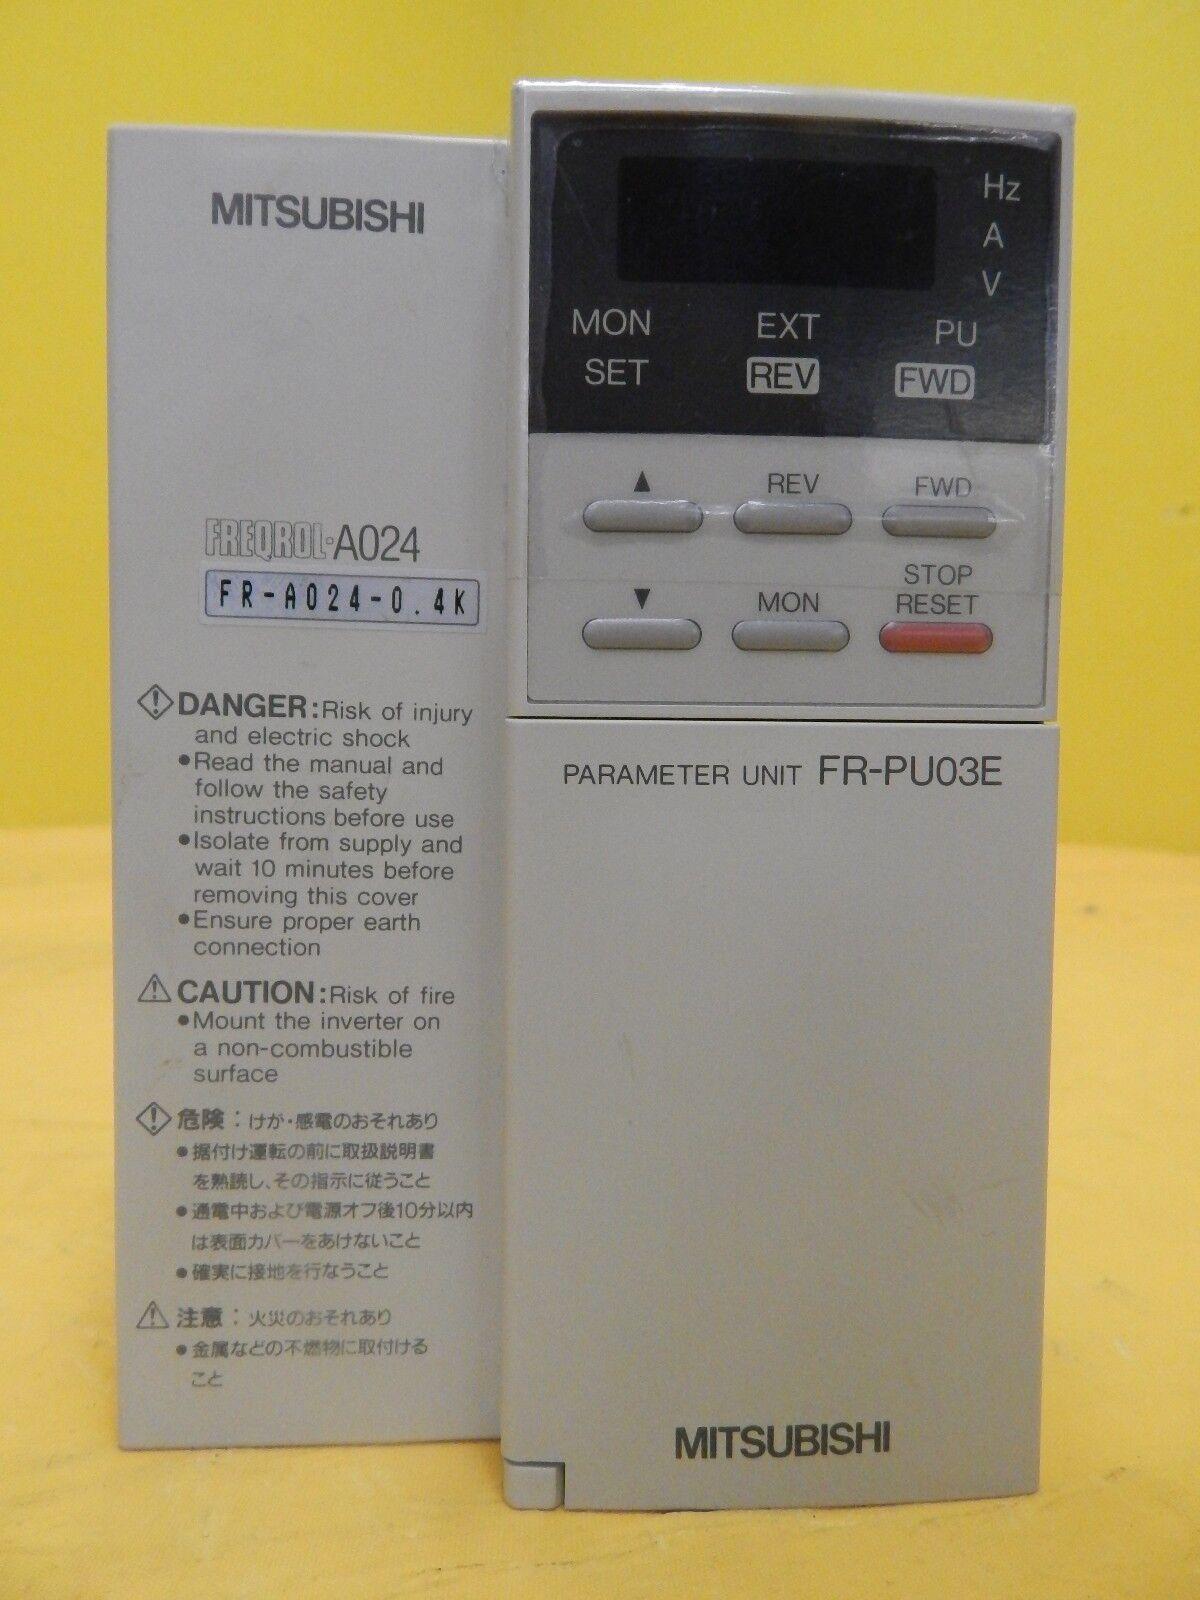 Mitsubishi FR-A024-0.4K Inverter FREQROL-A024 Parameter Unit FR-PU03E Used